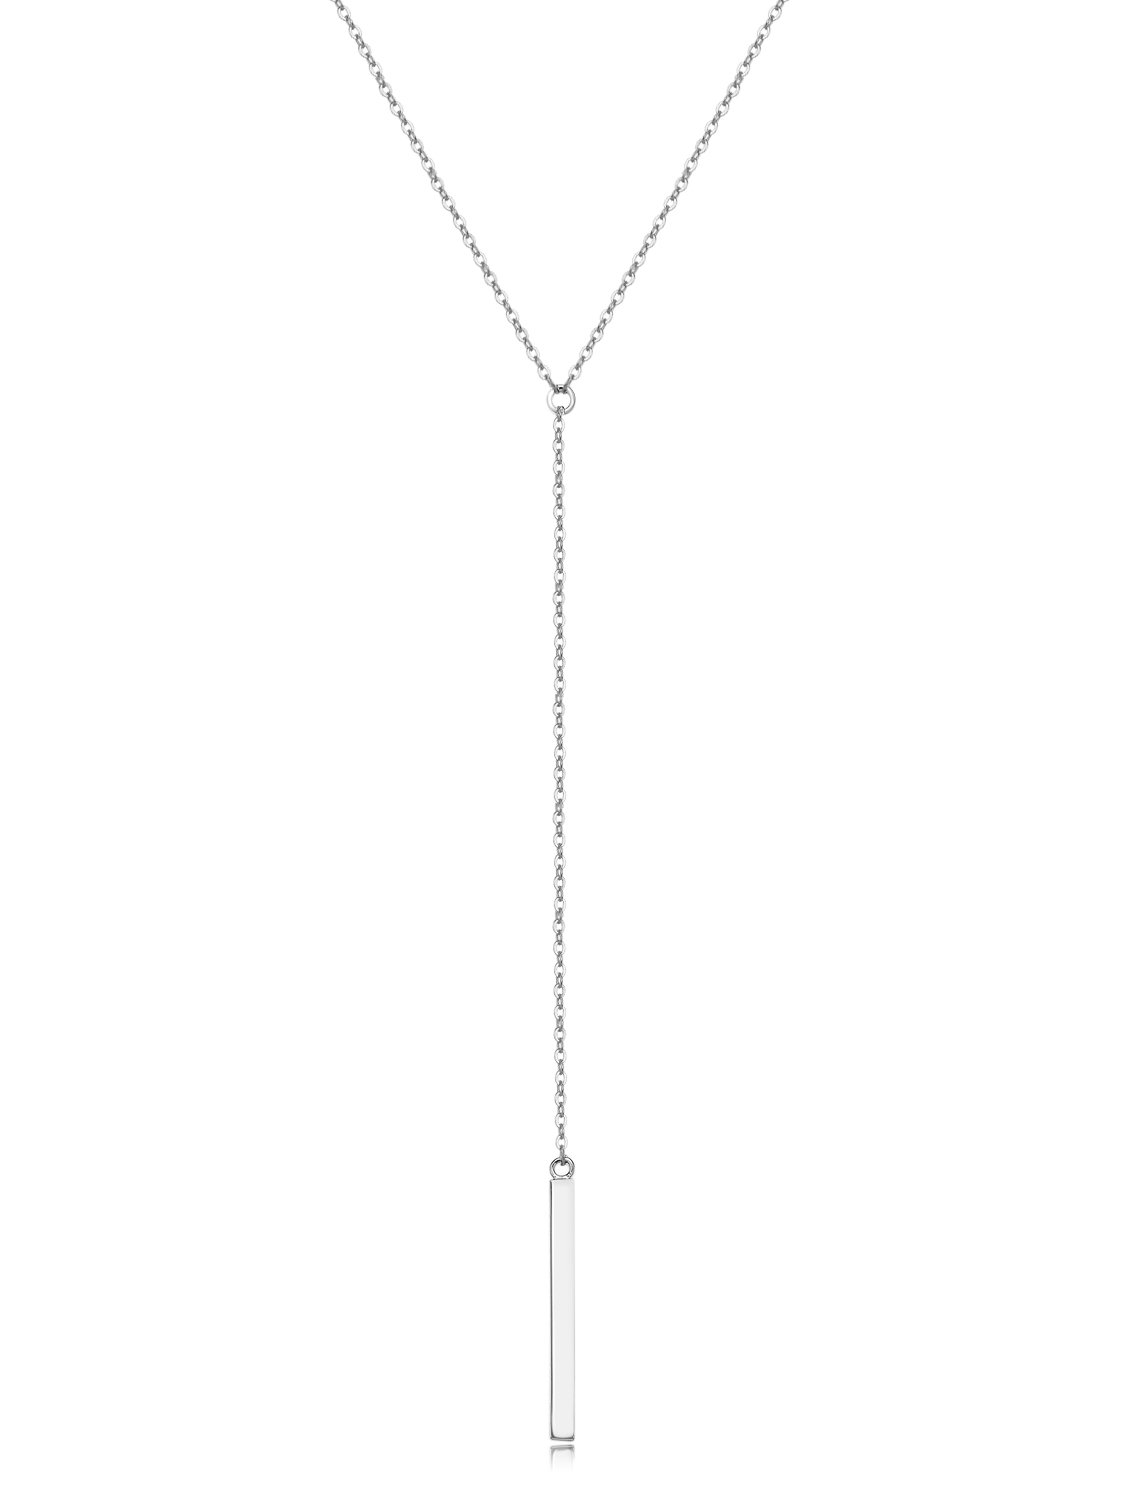 Metzakka Sterling Silver Lariat Necklace, Chic Minimalist Drop Bar Y Chain Necklace for Women by Metzakka